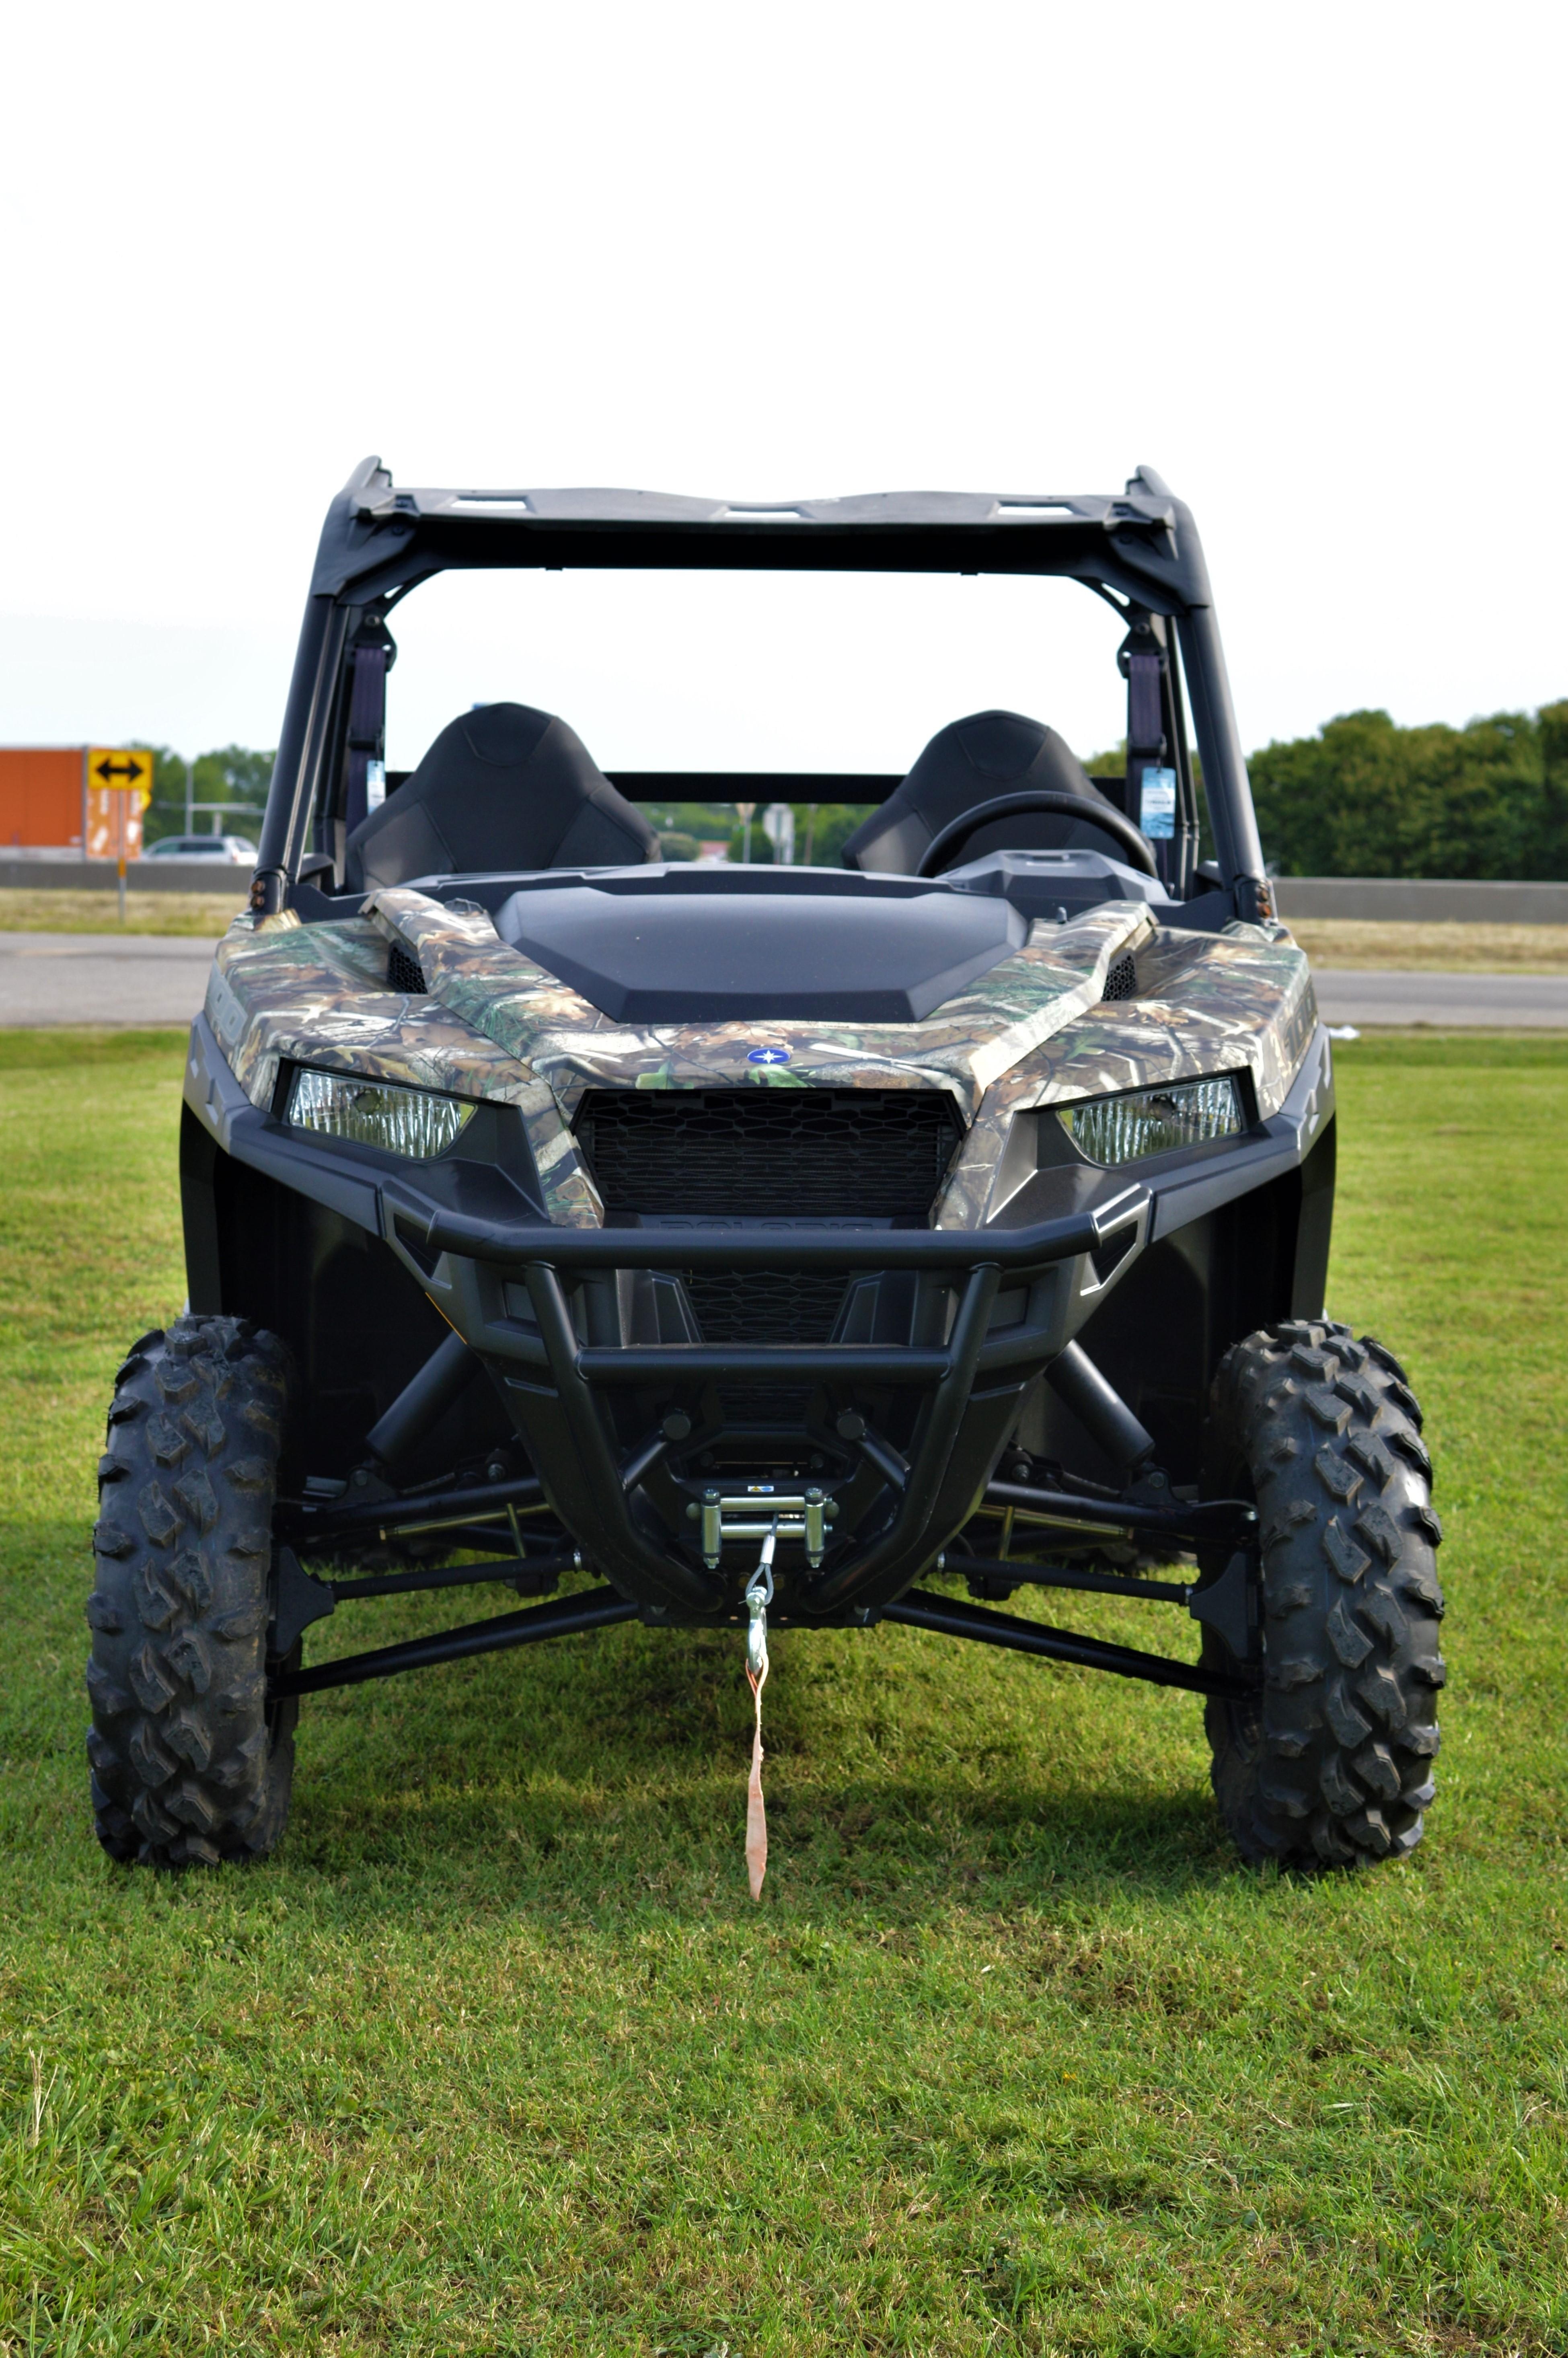 Nor-Tex Tractor | Equipment sales in Sulphur Springs, TX